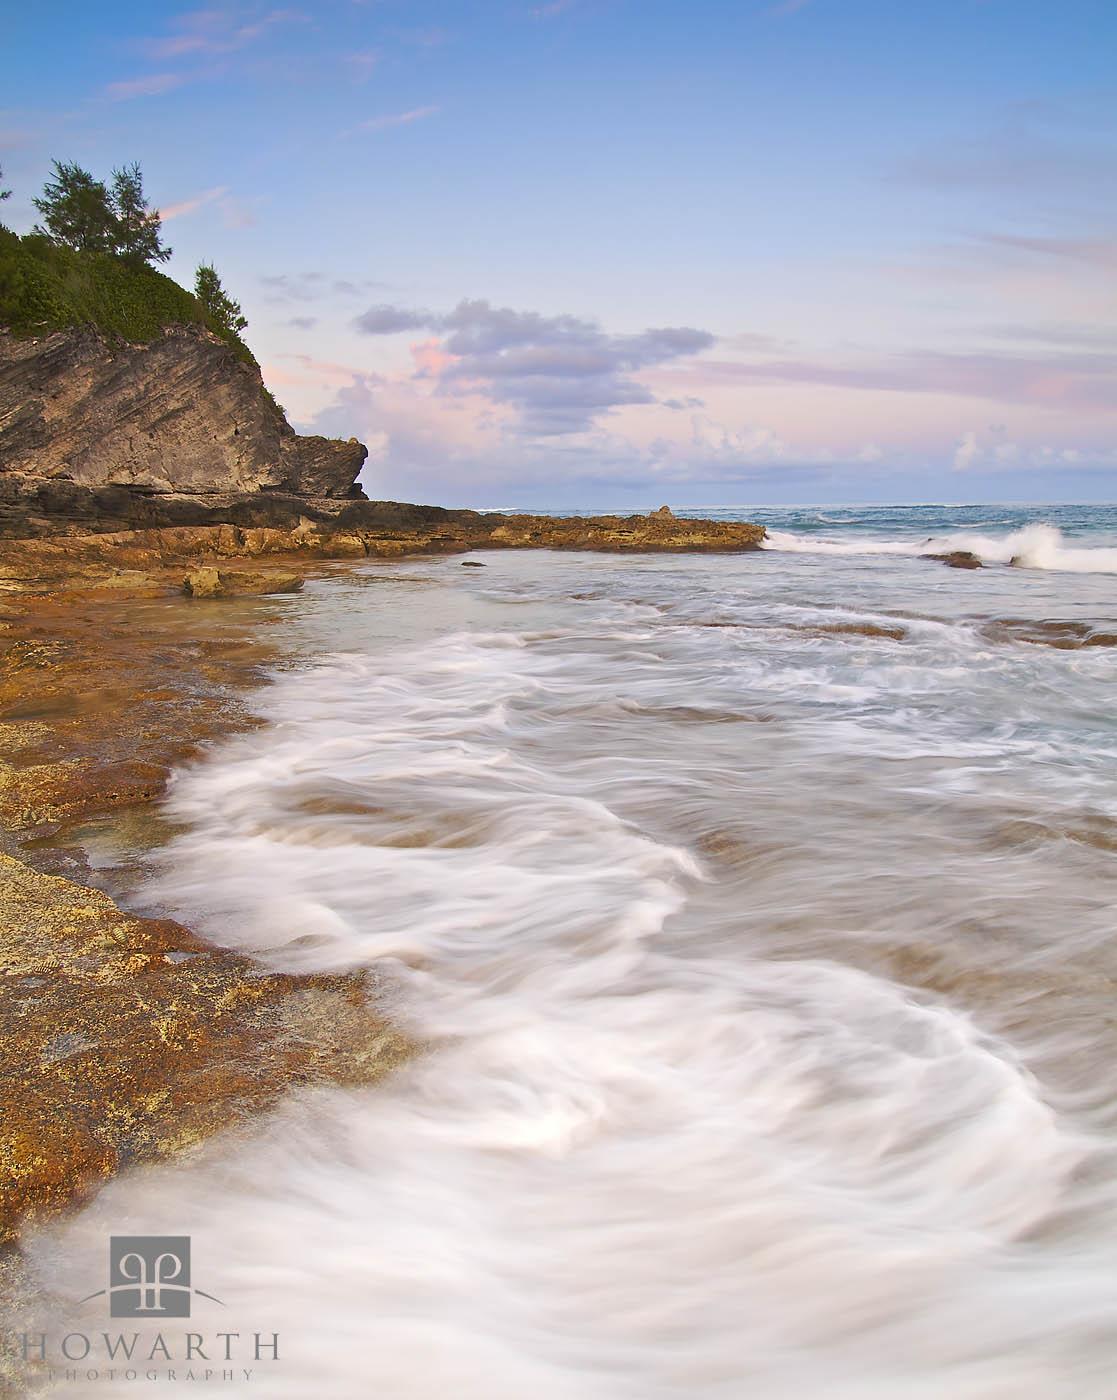 devonshire, bay, coastline, ashore, rocky, photo